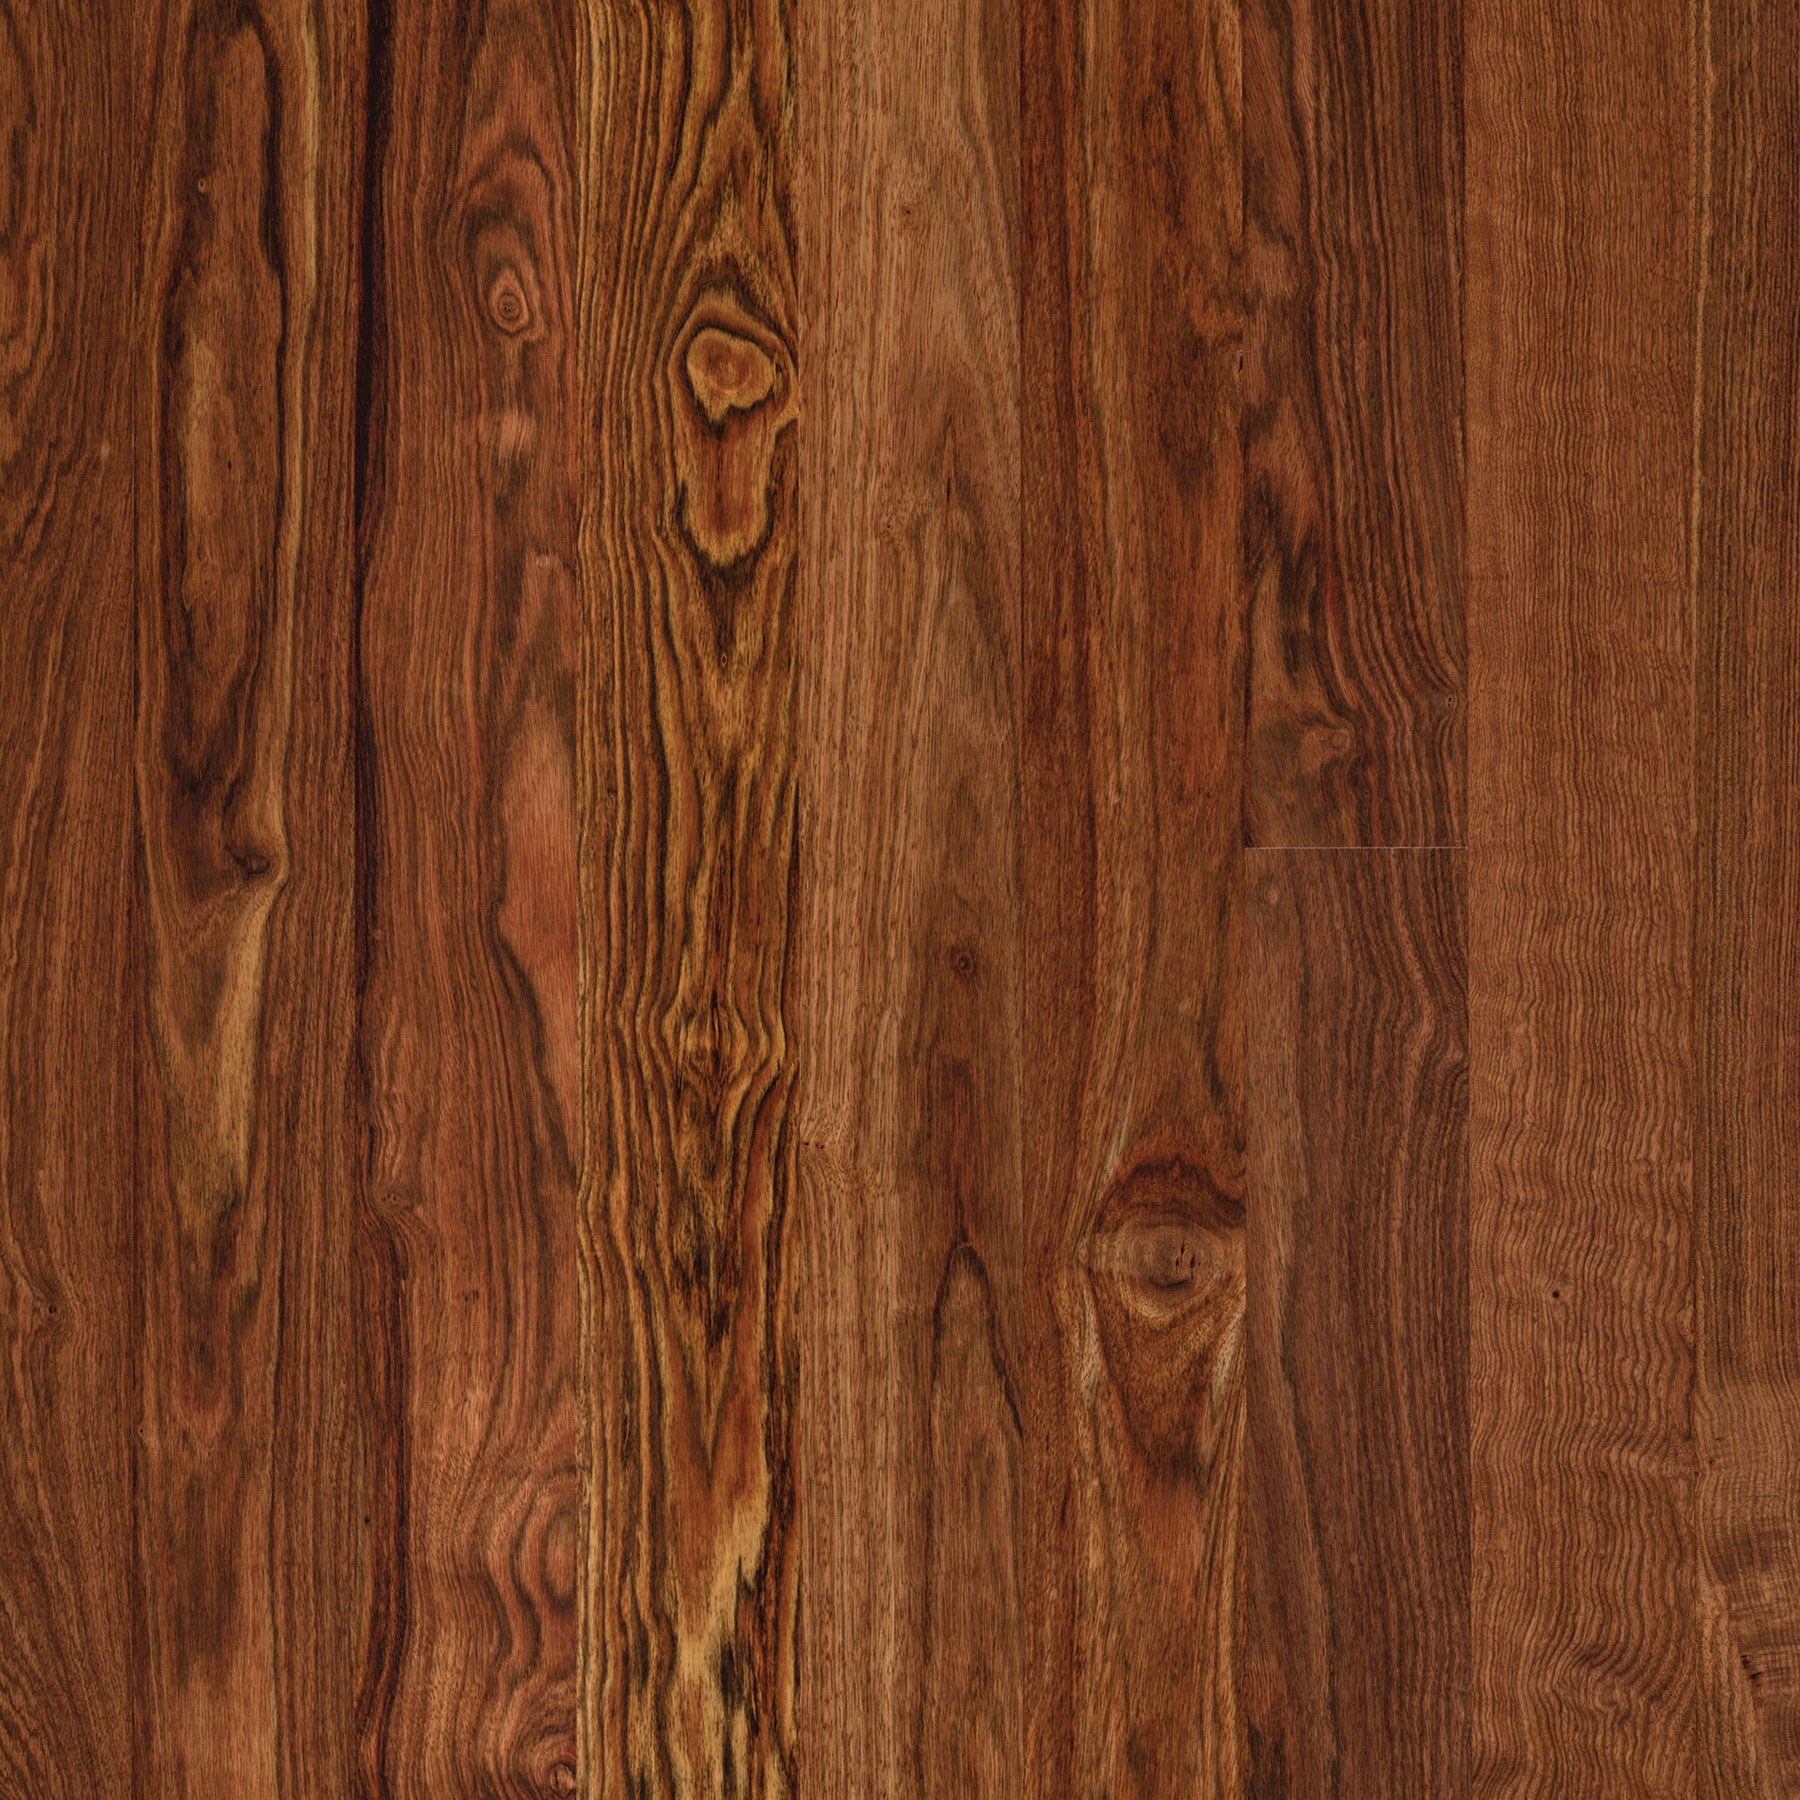 Great Southern Woods Caribbean, Rosewood Laminate Flooring Home Depot